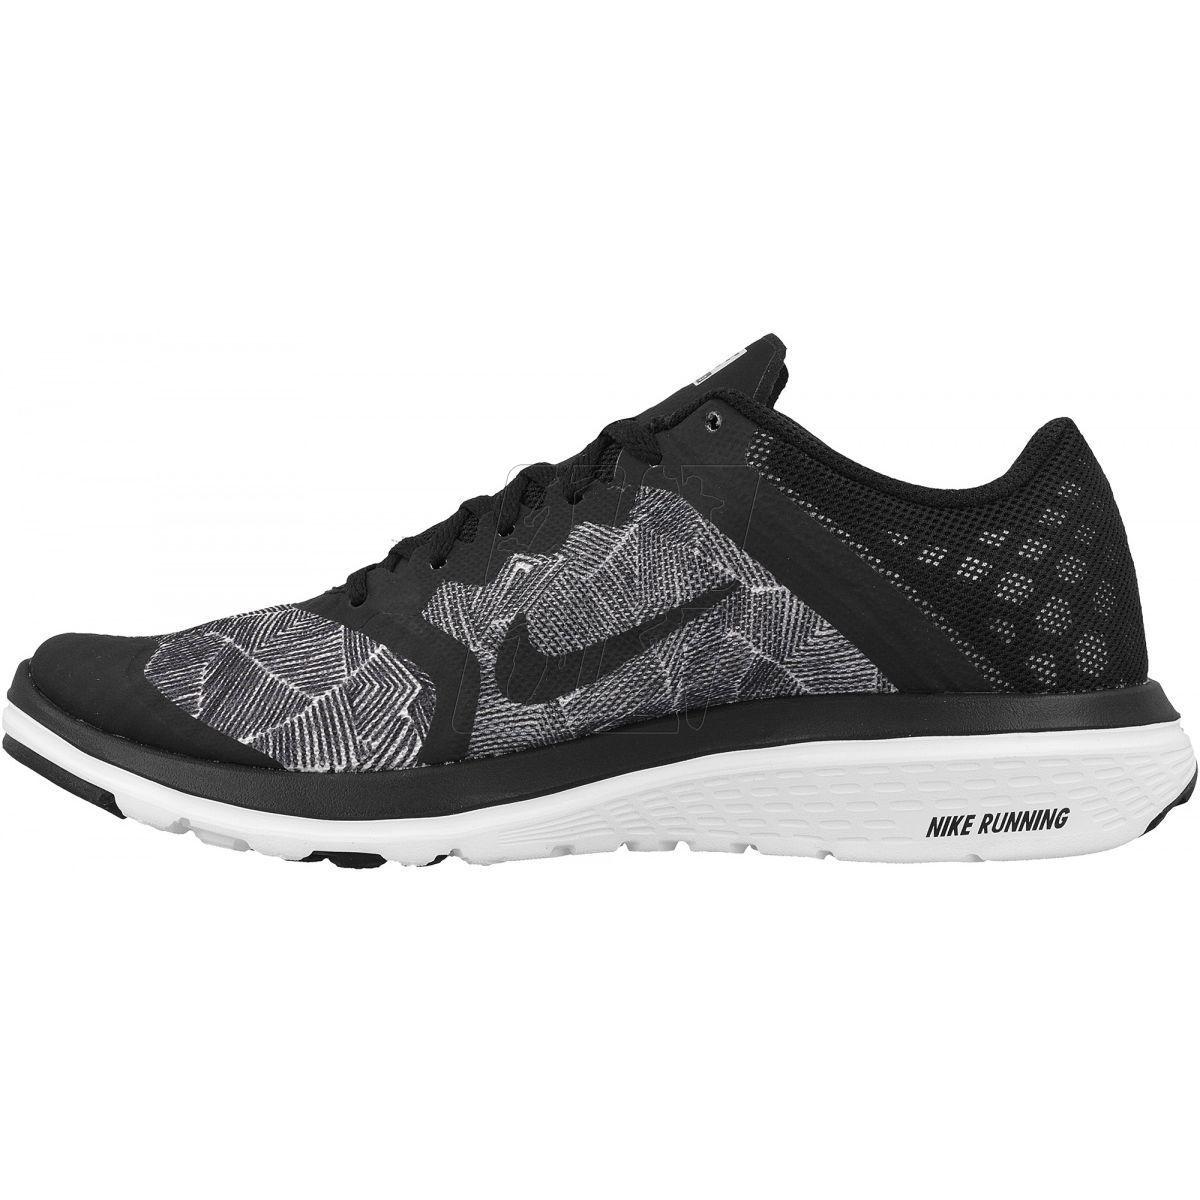 Buty Biegowe Nike Fs Lite Run 3 Print W 819167 001 Profesjonalny Sklep Sportowy Hurtowniasportowa Net Hoka Running Shoes Sneakers Running